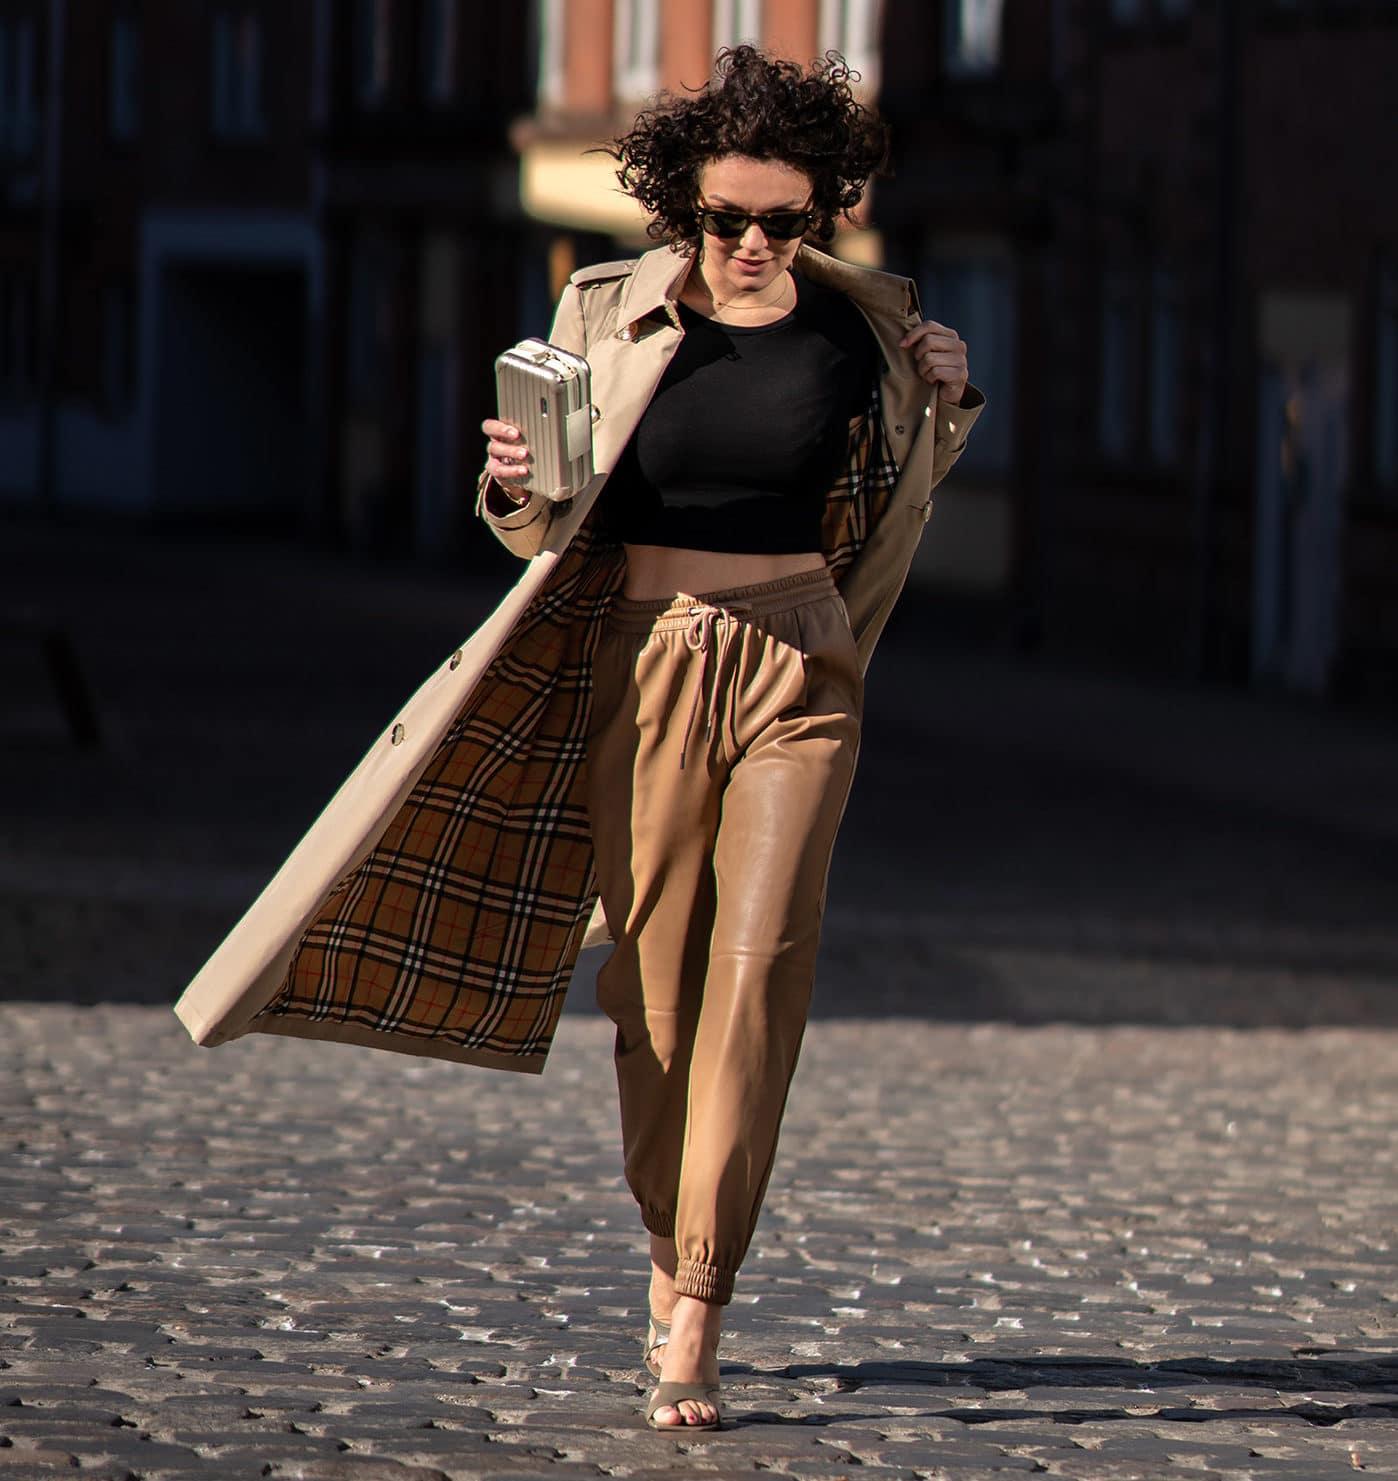 Girl walking in burberry trench coat